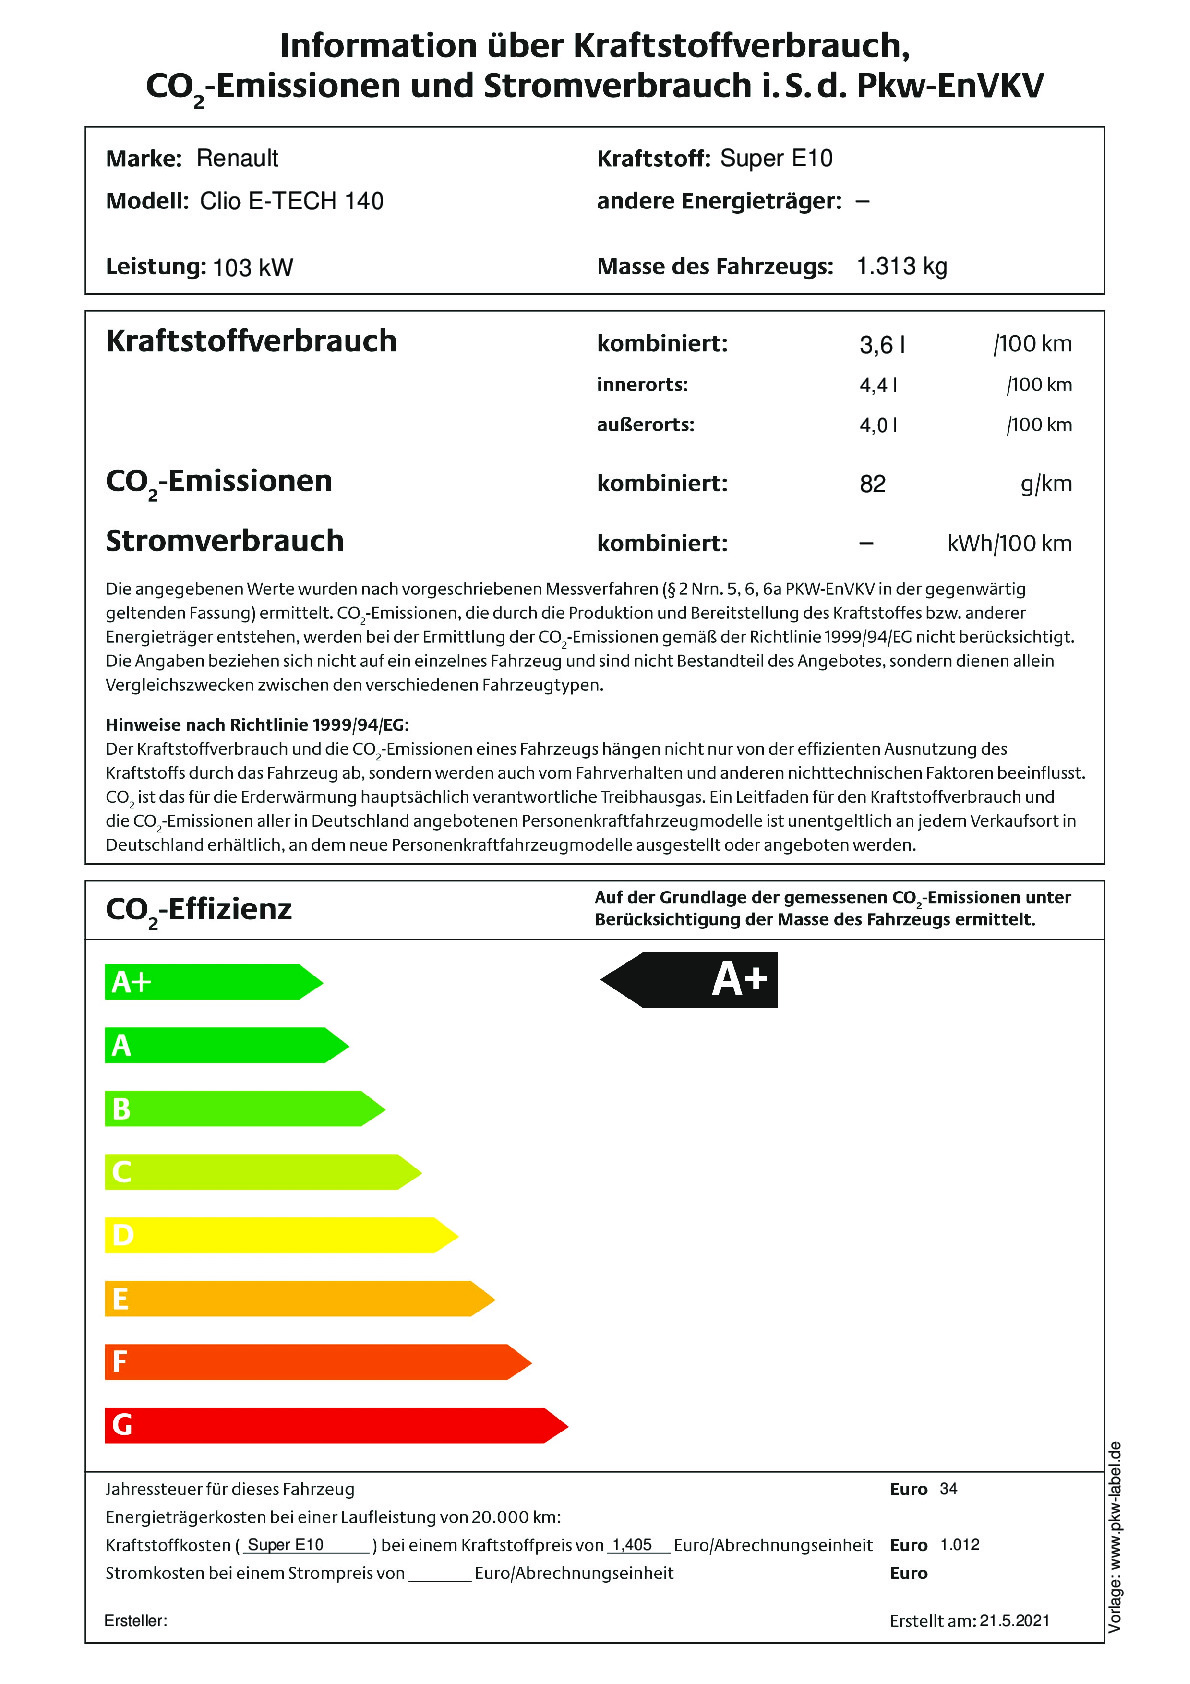 Energielabel E-TECH 140